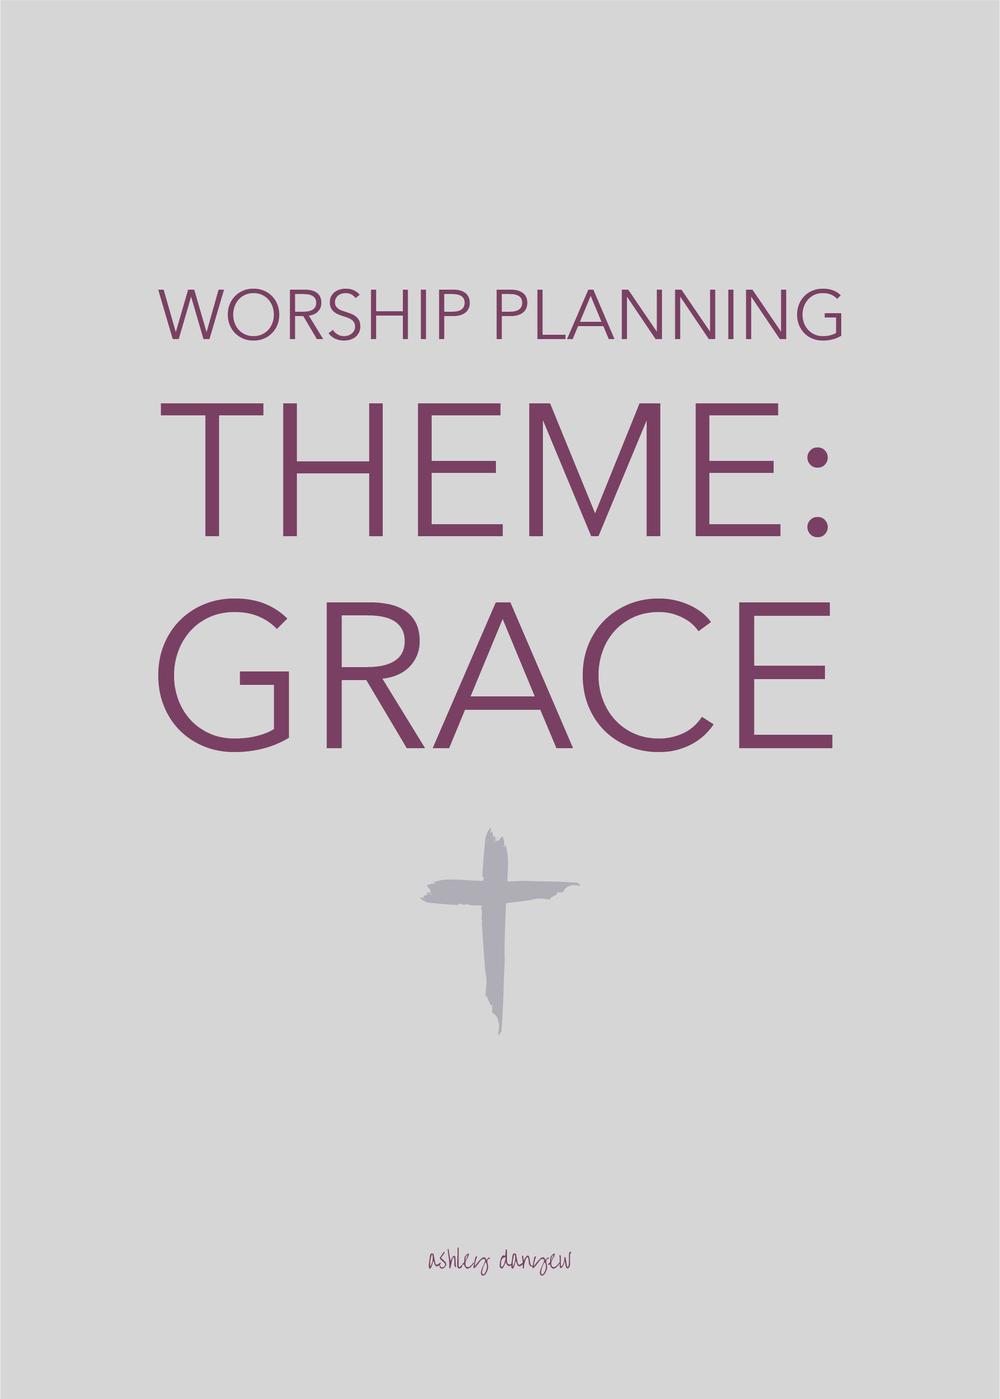 Copy of Worship Planning Theme: Grace